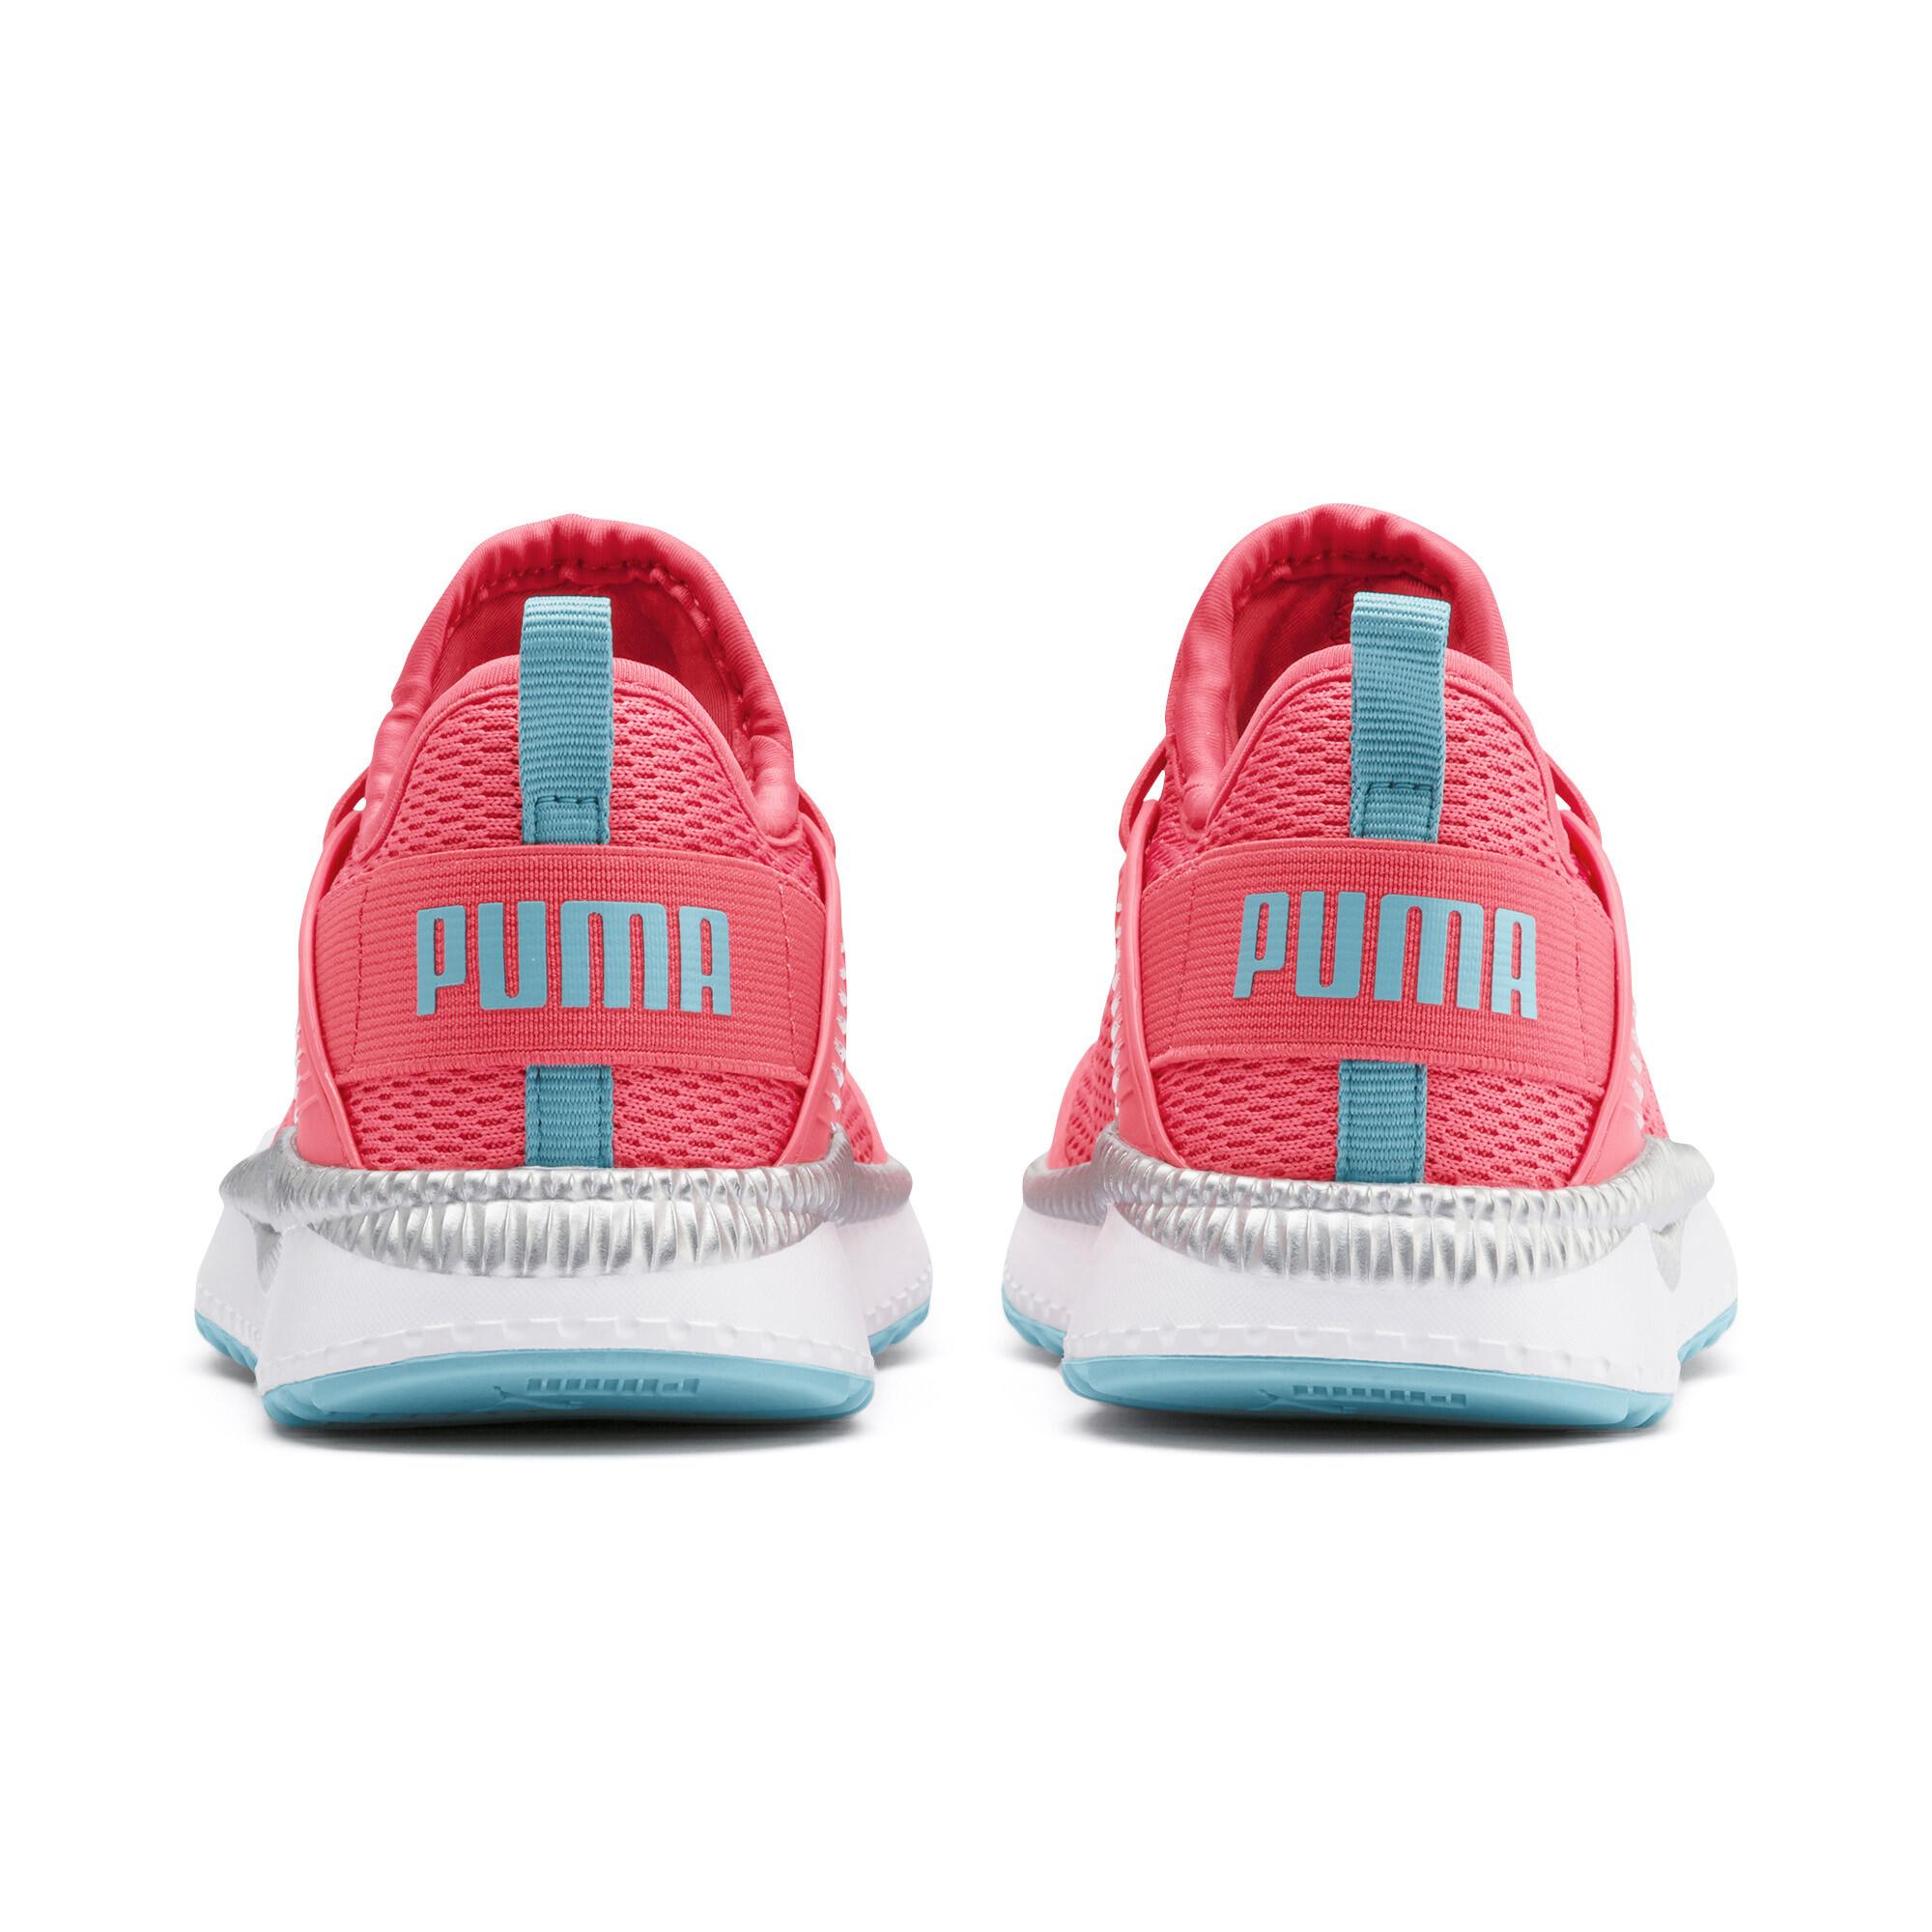 PUMA-Pacer-Next-Cage-Metallic-Little-Kids-039-Shoes-Girls-Shoe-Kids thumbnail 9